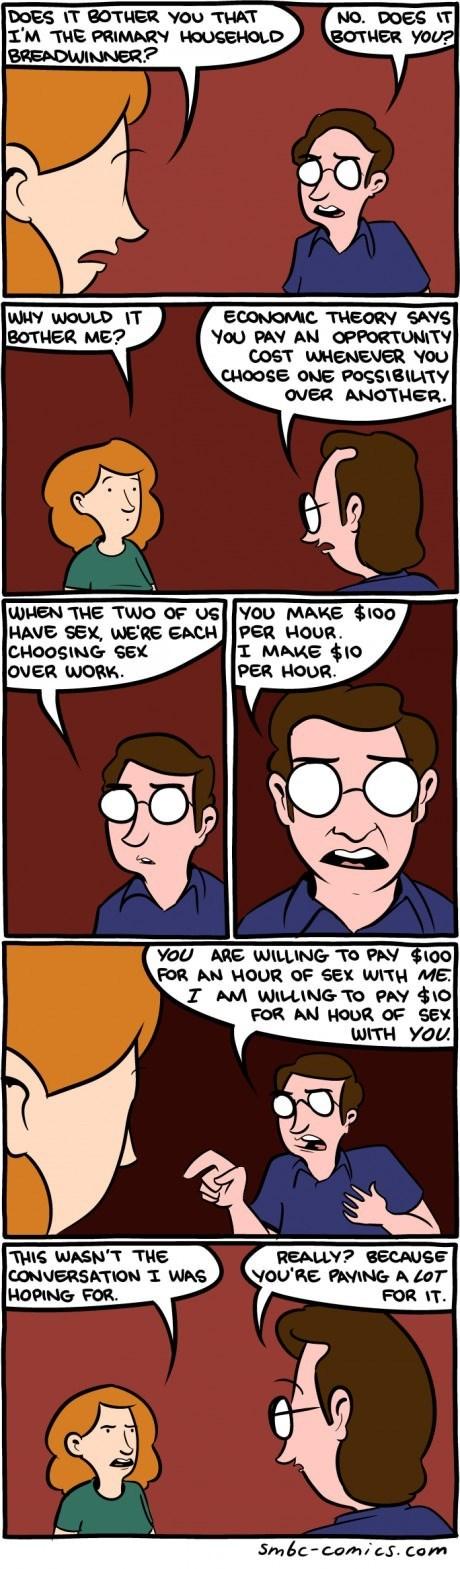 relationships money web comics - 8160579840